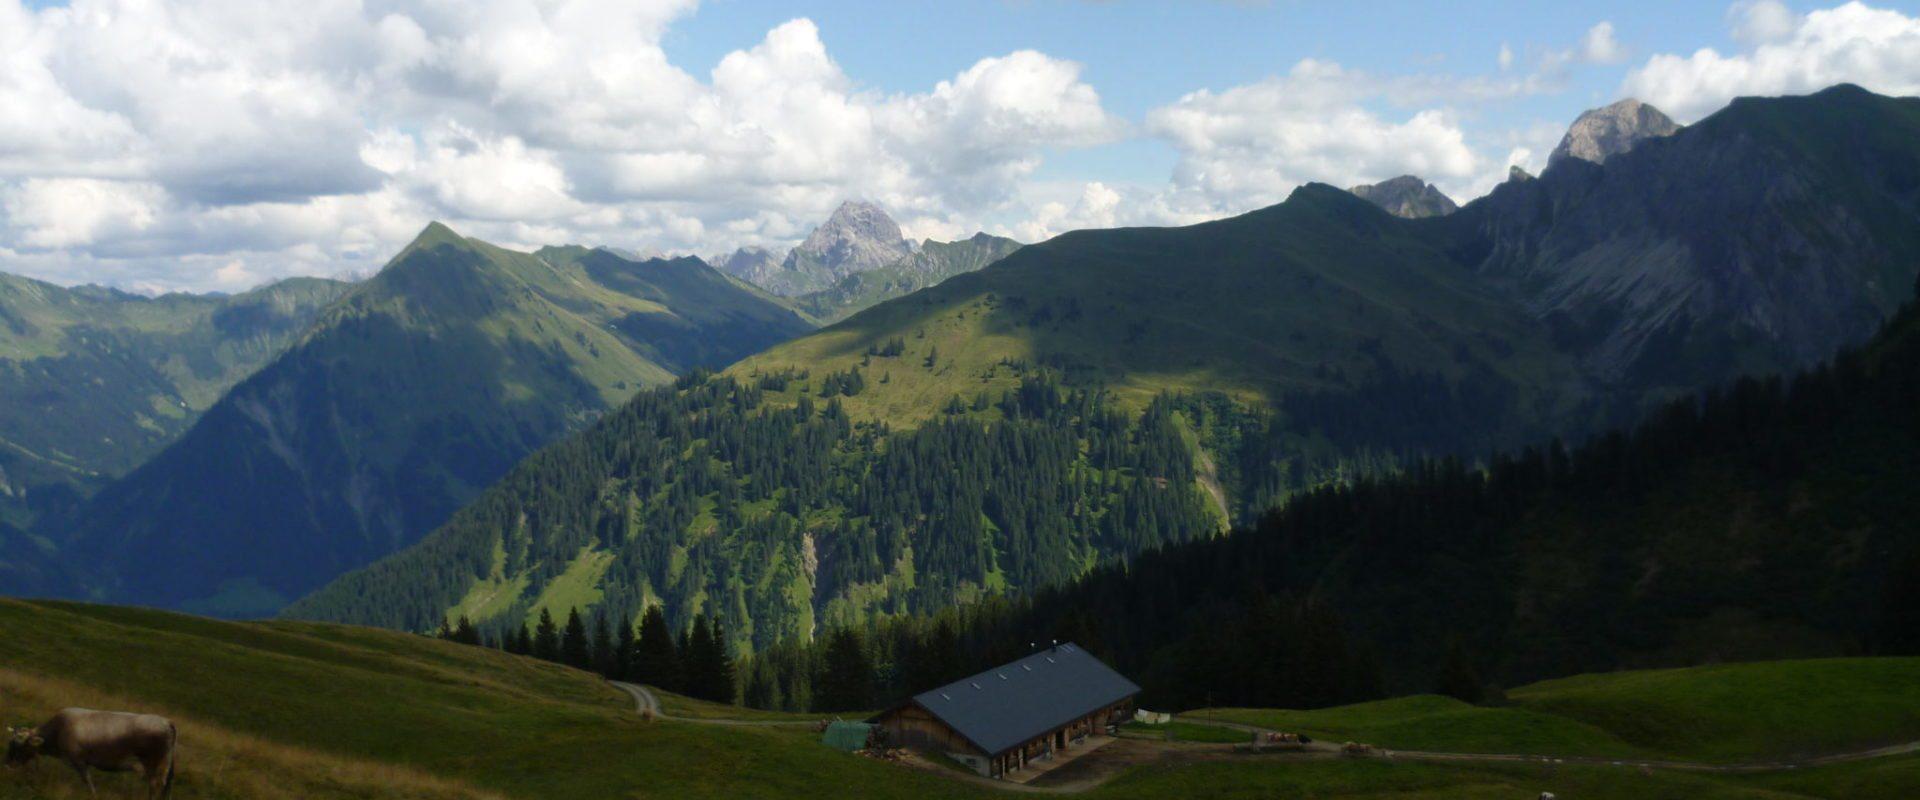 Hüttenwanderung Schadonagebiet 2015 (25)_Conny Kriegner